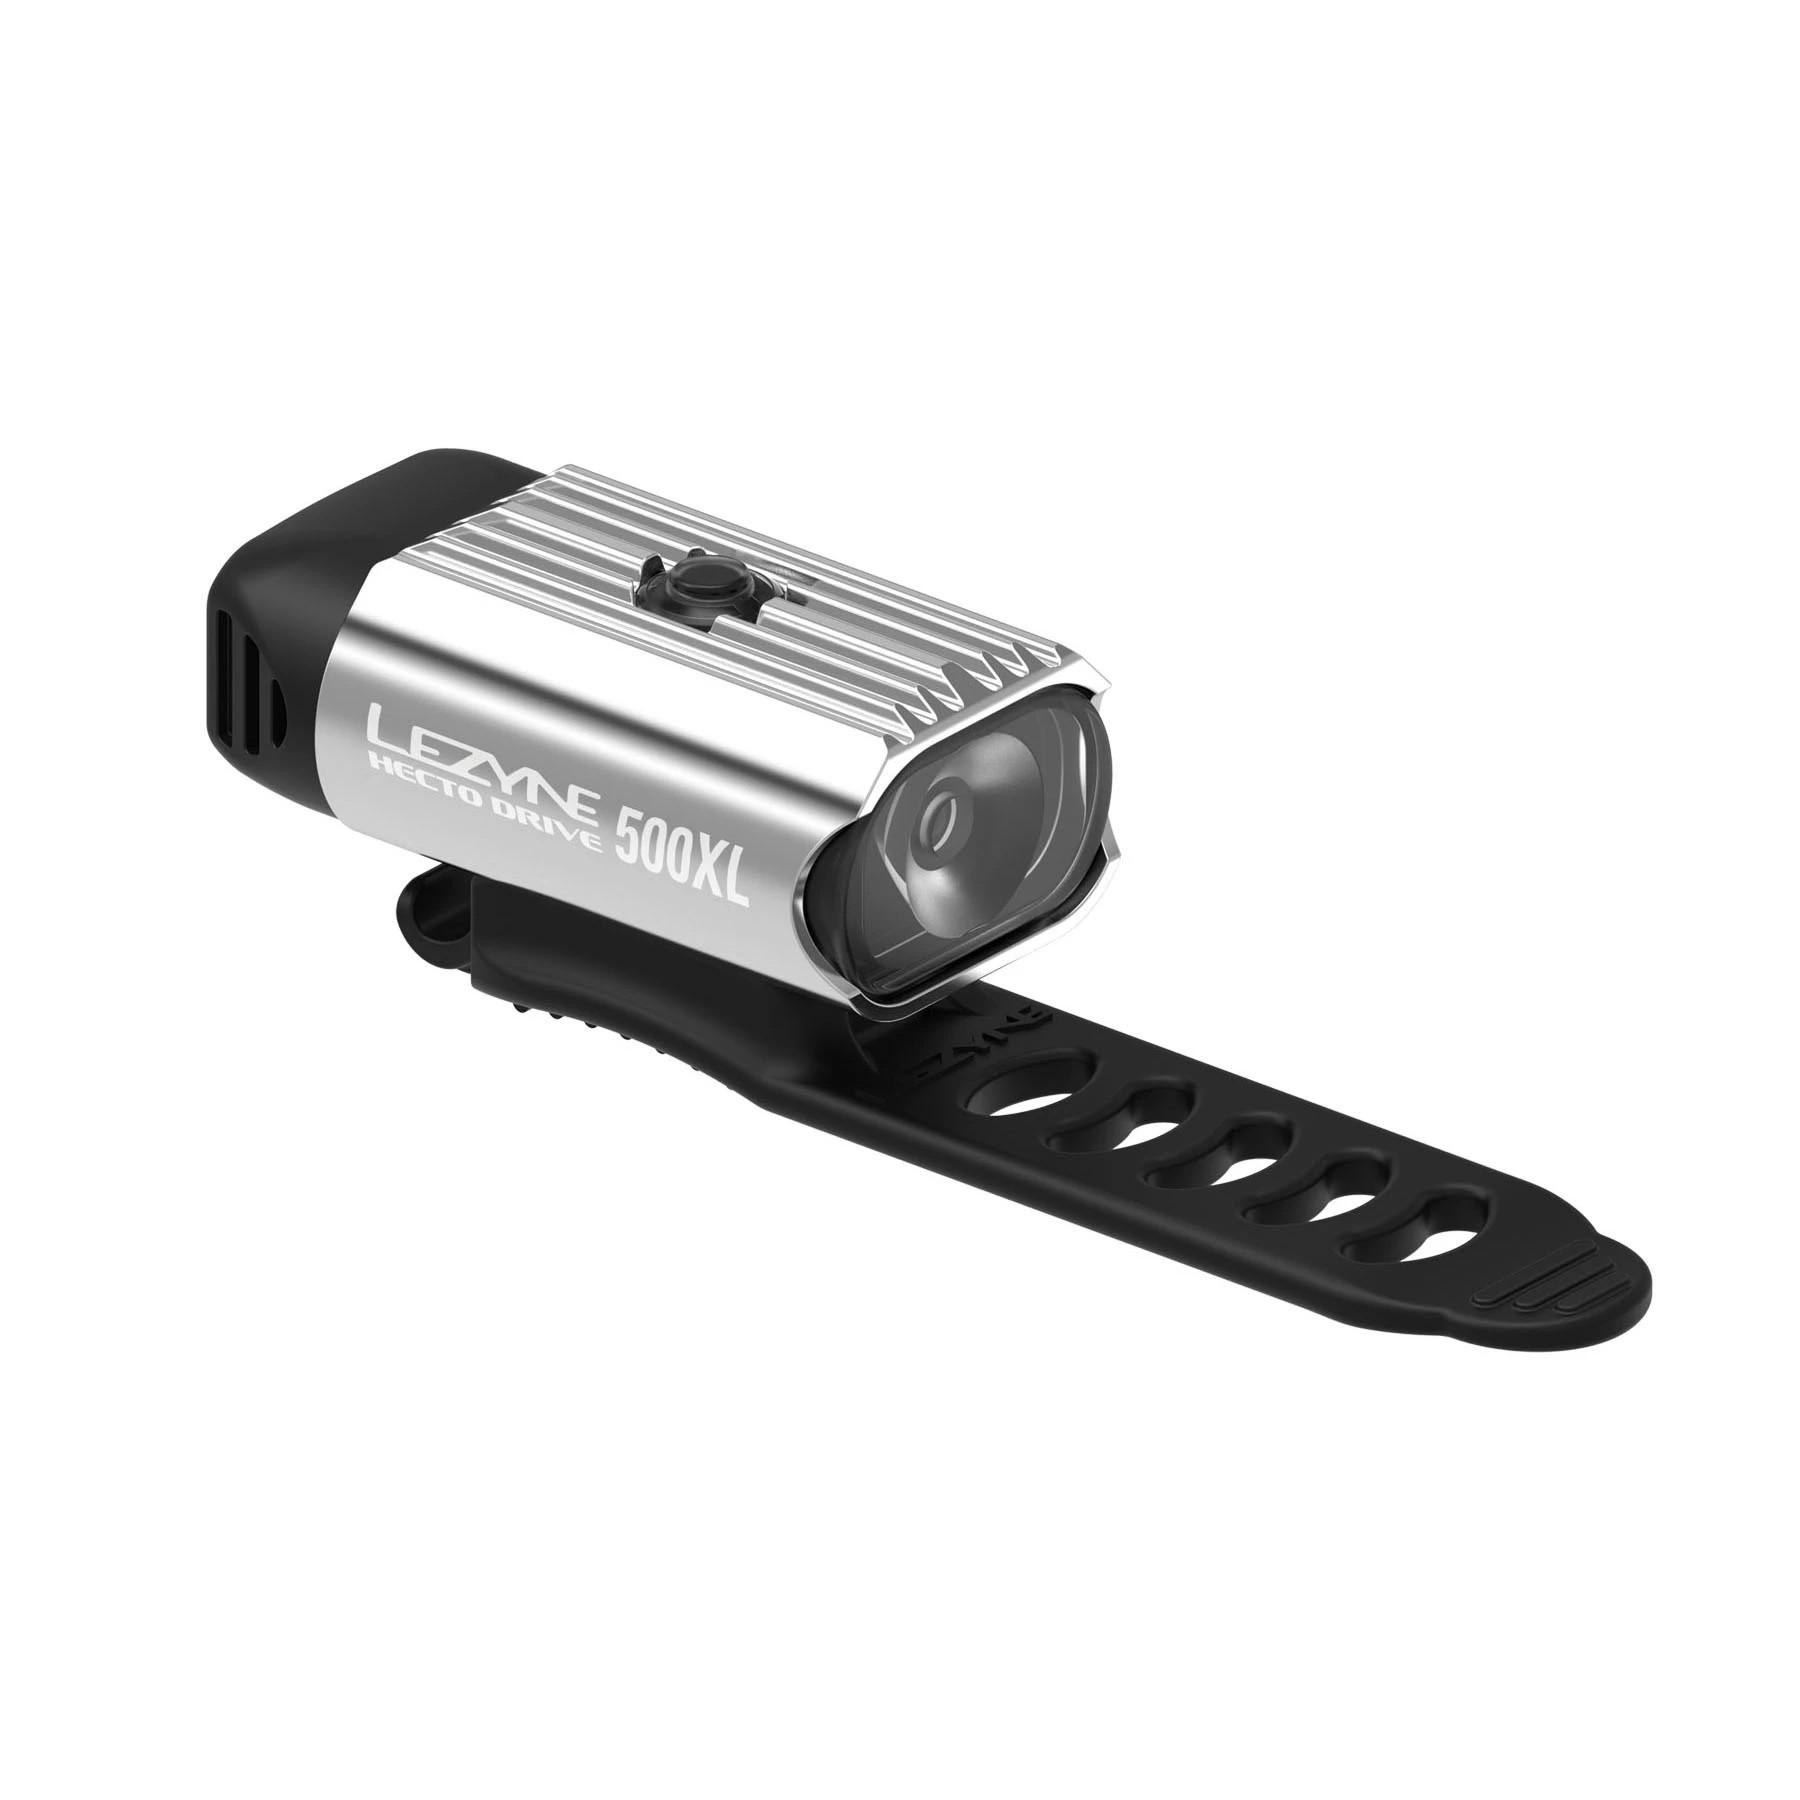 Farol LEZYNE LED Hecto Drive 500XL - 20Hrs & 500 Lumens